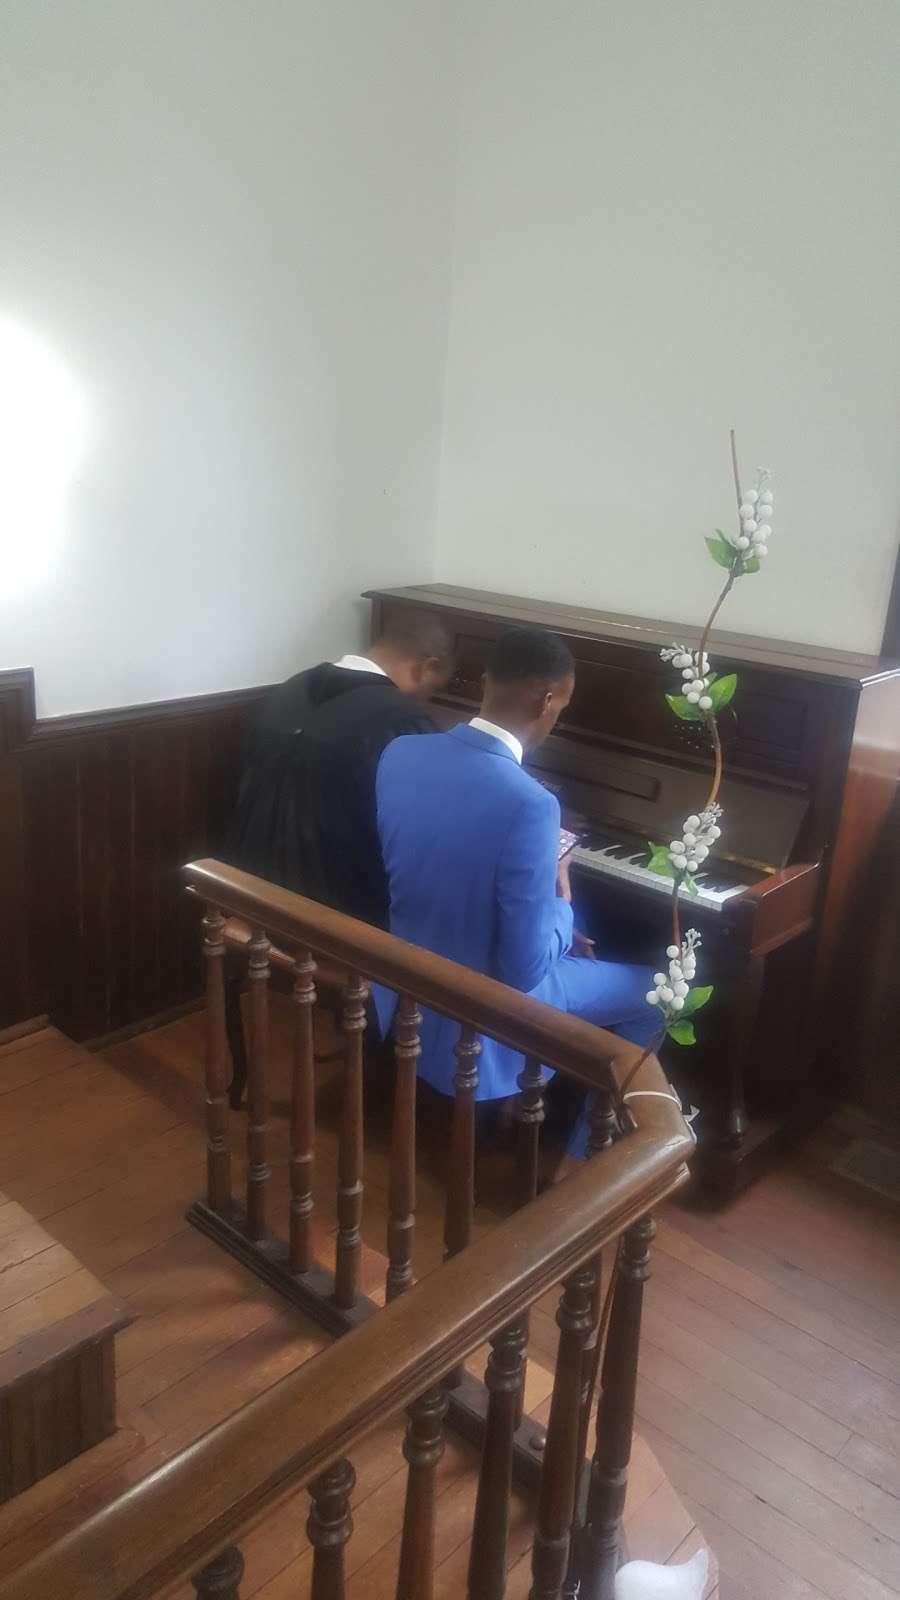 Dorsey Chapel - church  | Photo 7 of 10 | Address: 10704 Brookland Rd, Glenn Dale, MD 20769, USA | Phone: (301) 352-5544